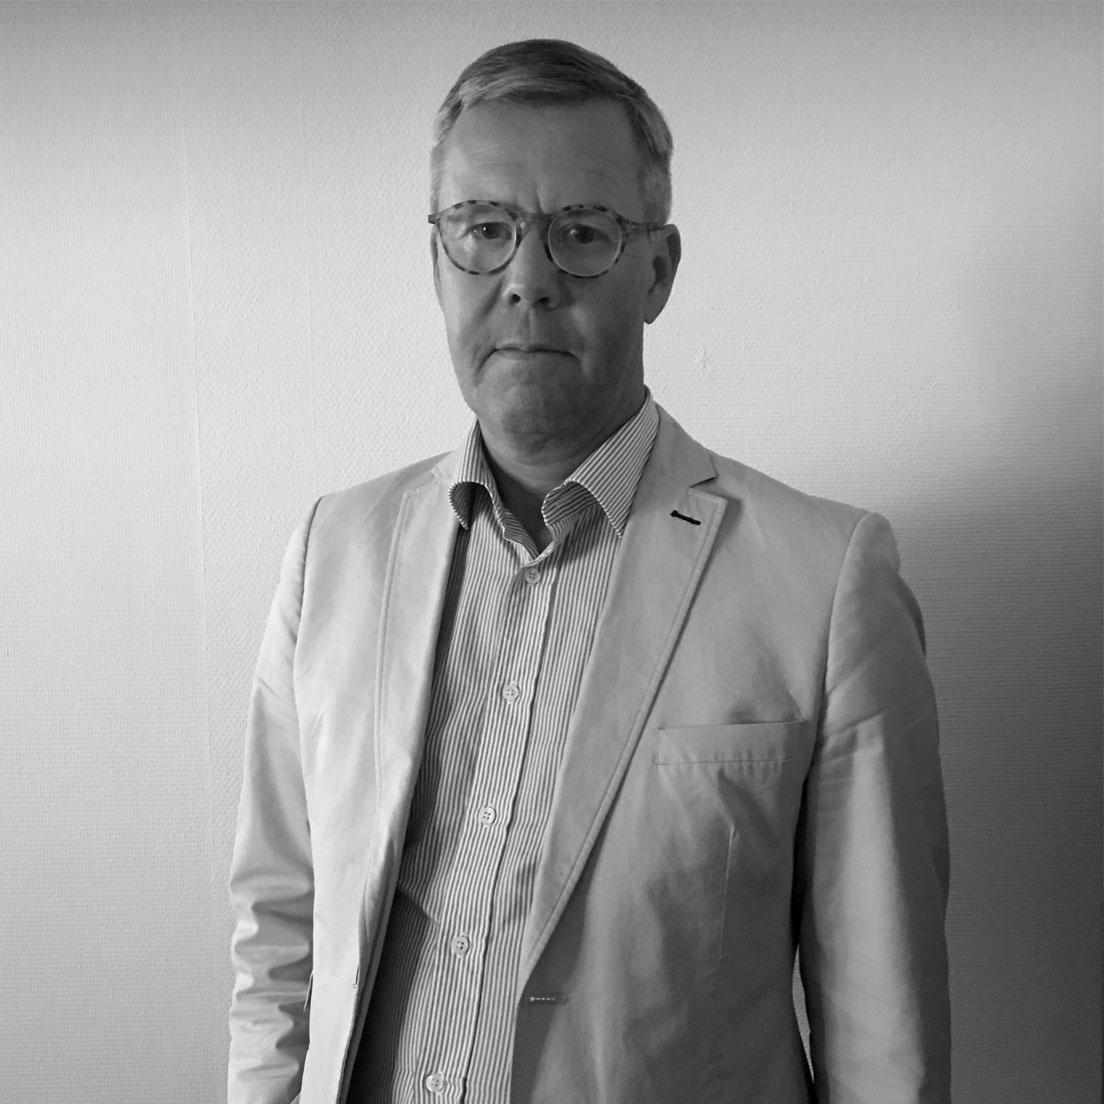 Lars Wahlström